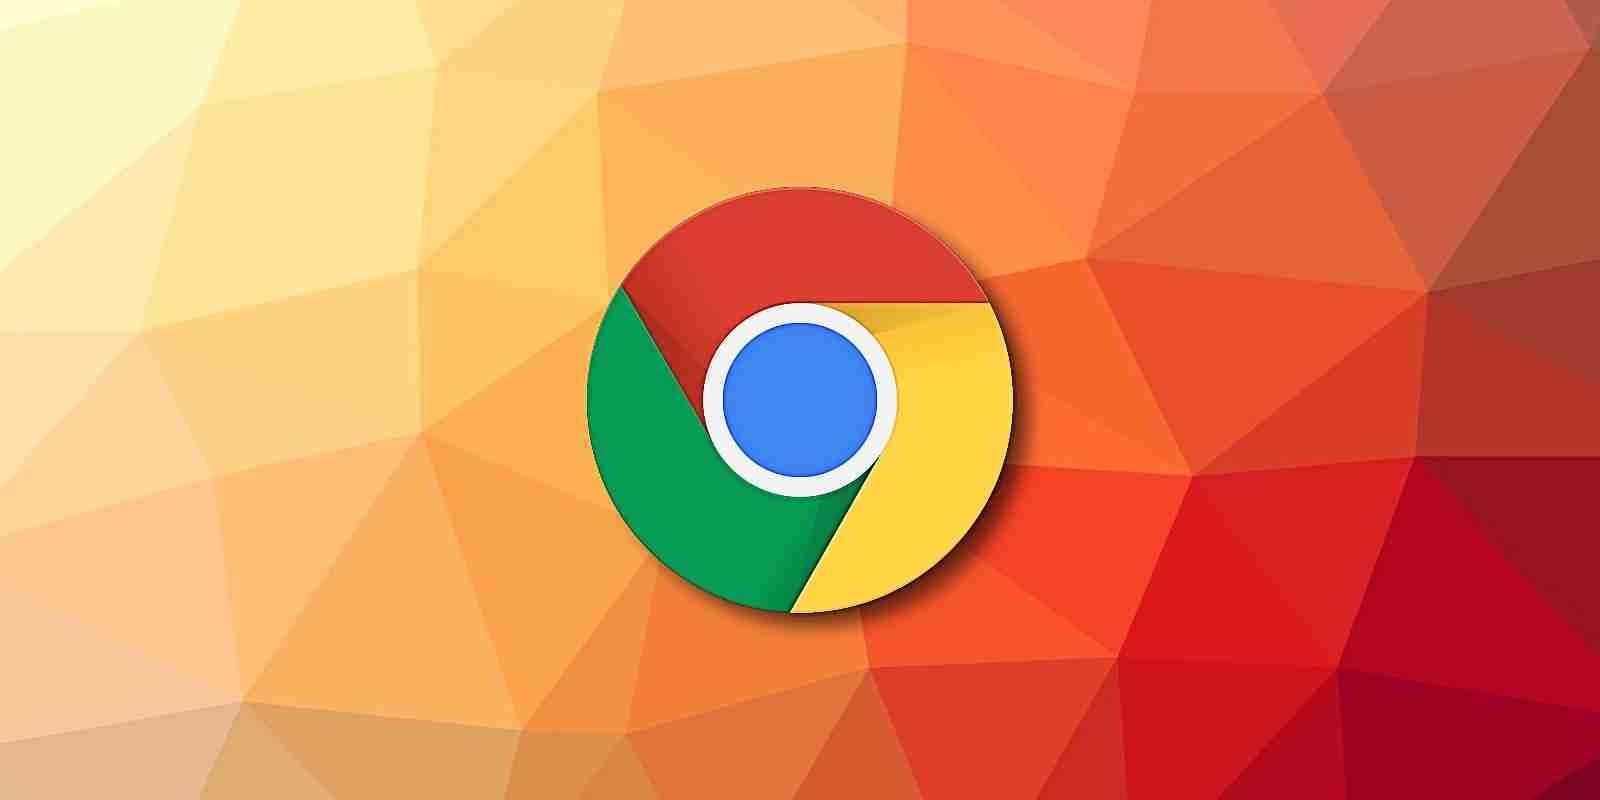 Google Chrome Now Checks For Weak Passwords, Helps Fix Them